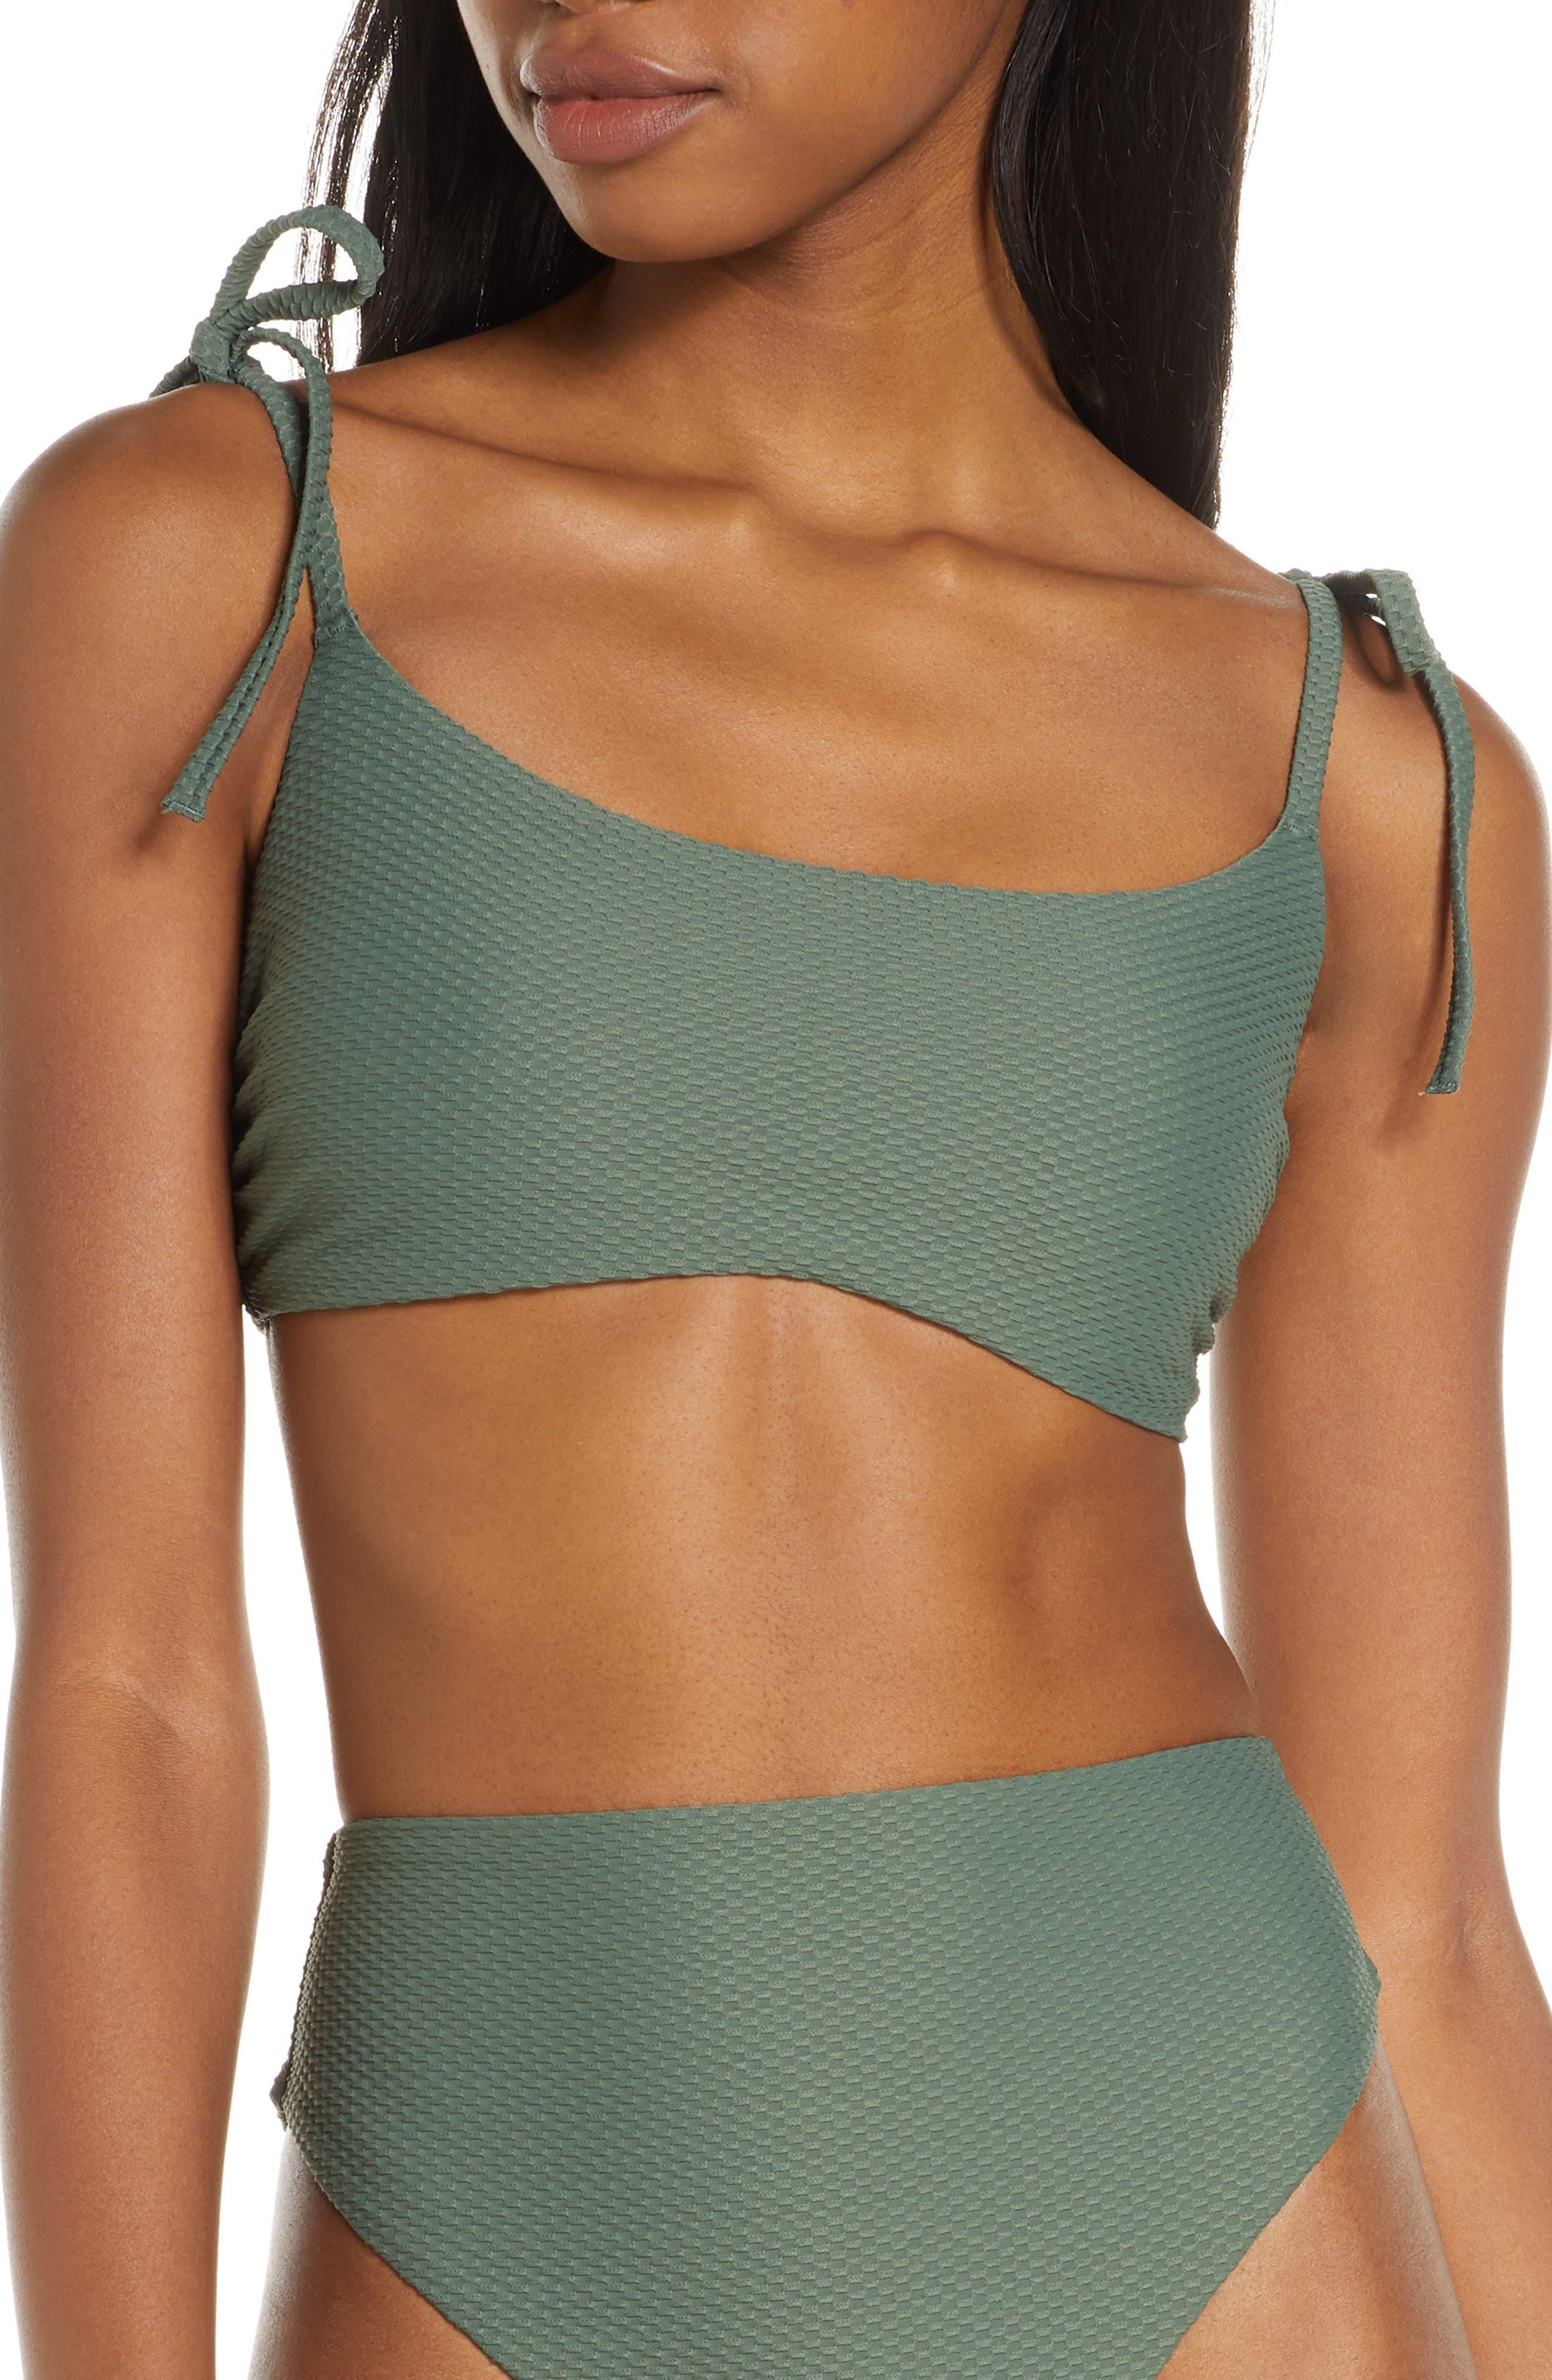 Chelsea28 Easy Retro Bikini Top, Green